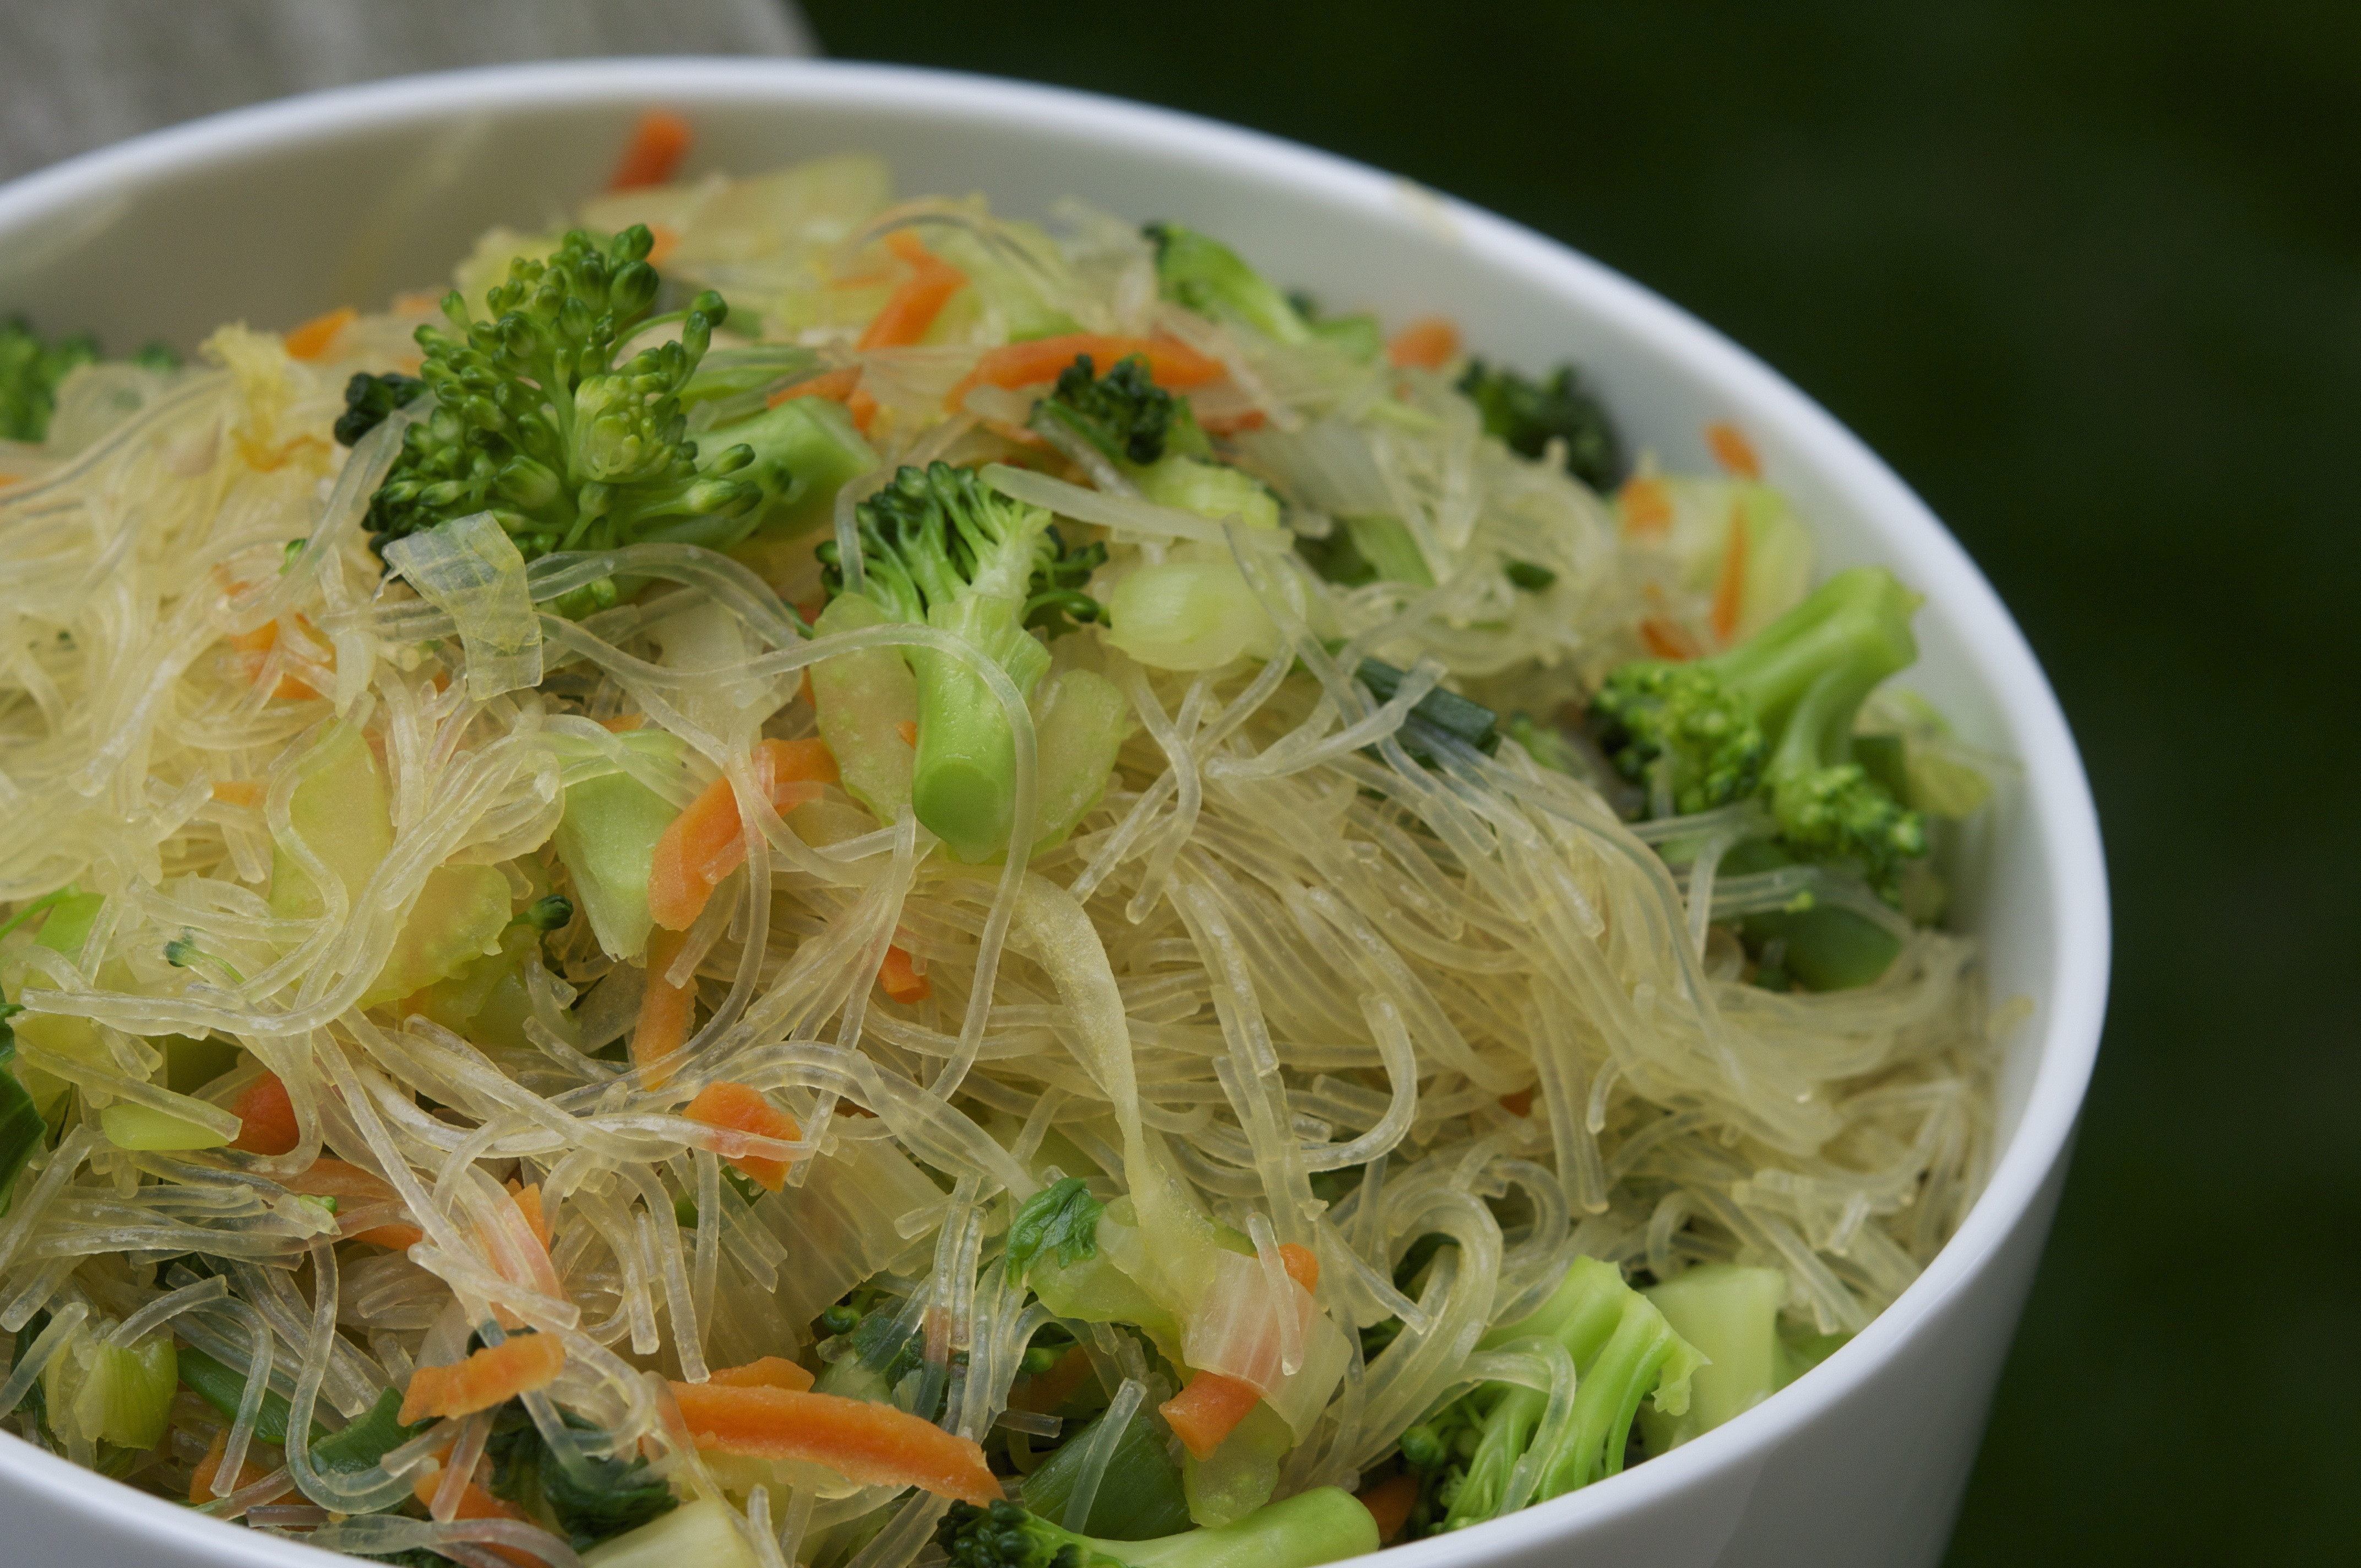 Vegetarian Rice Noodles Recipe  STIR FRIED RICE NOODLES WITH VEGETABLES